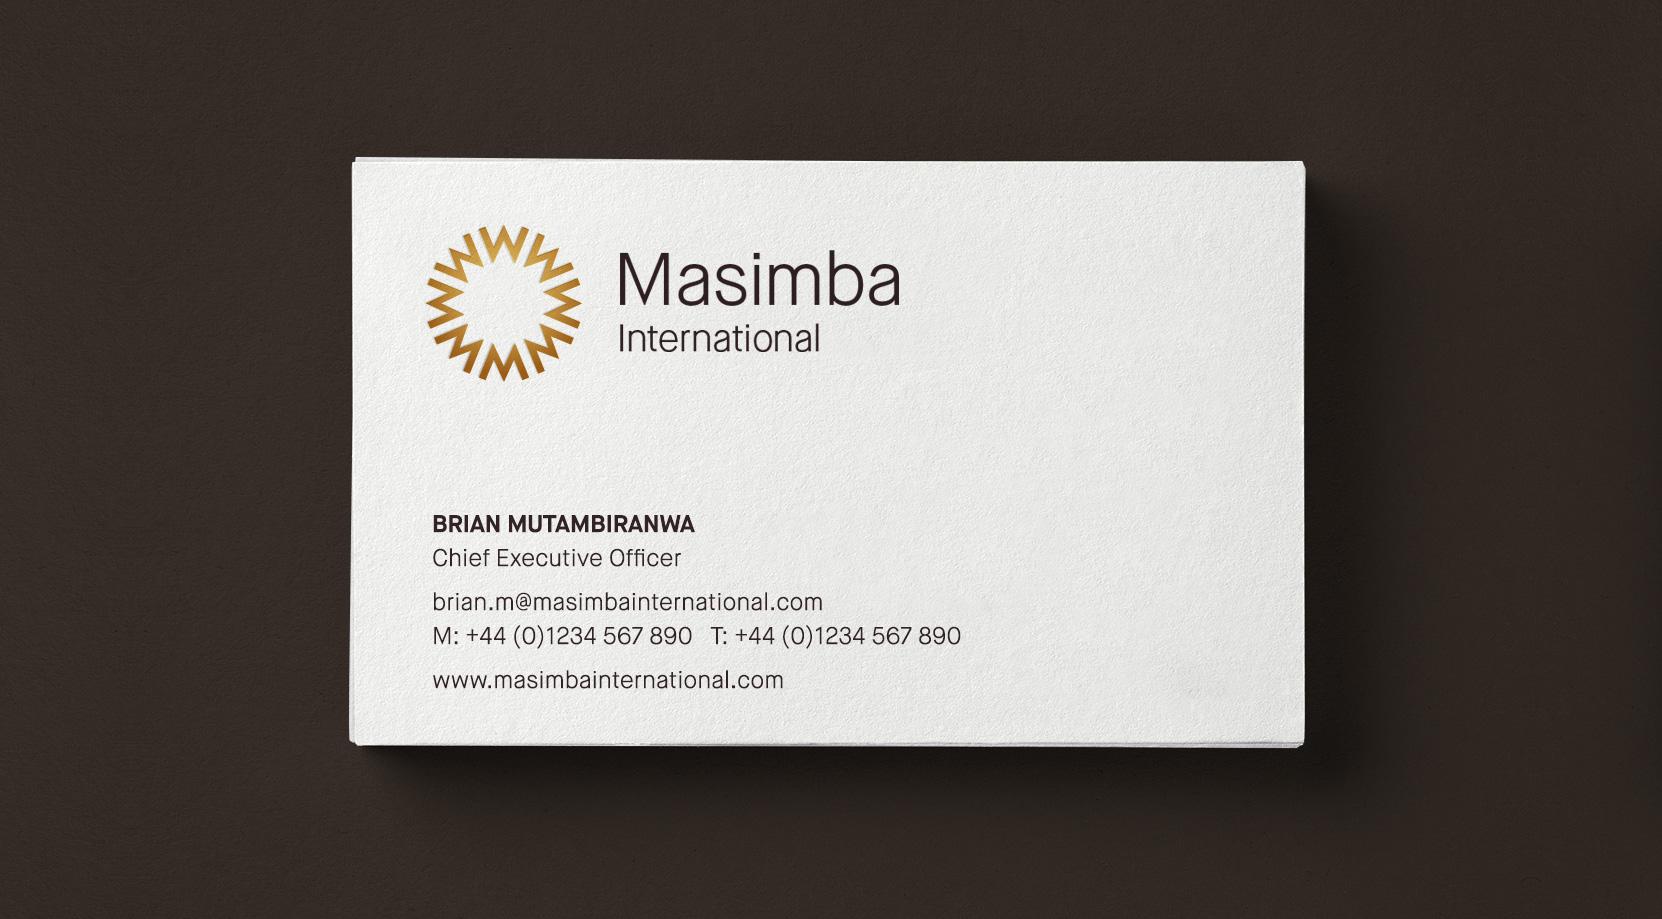 Masimba-identity-by-Ian-Whalley-card.jpg